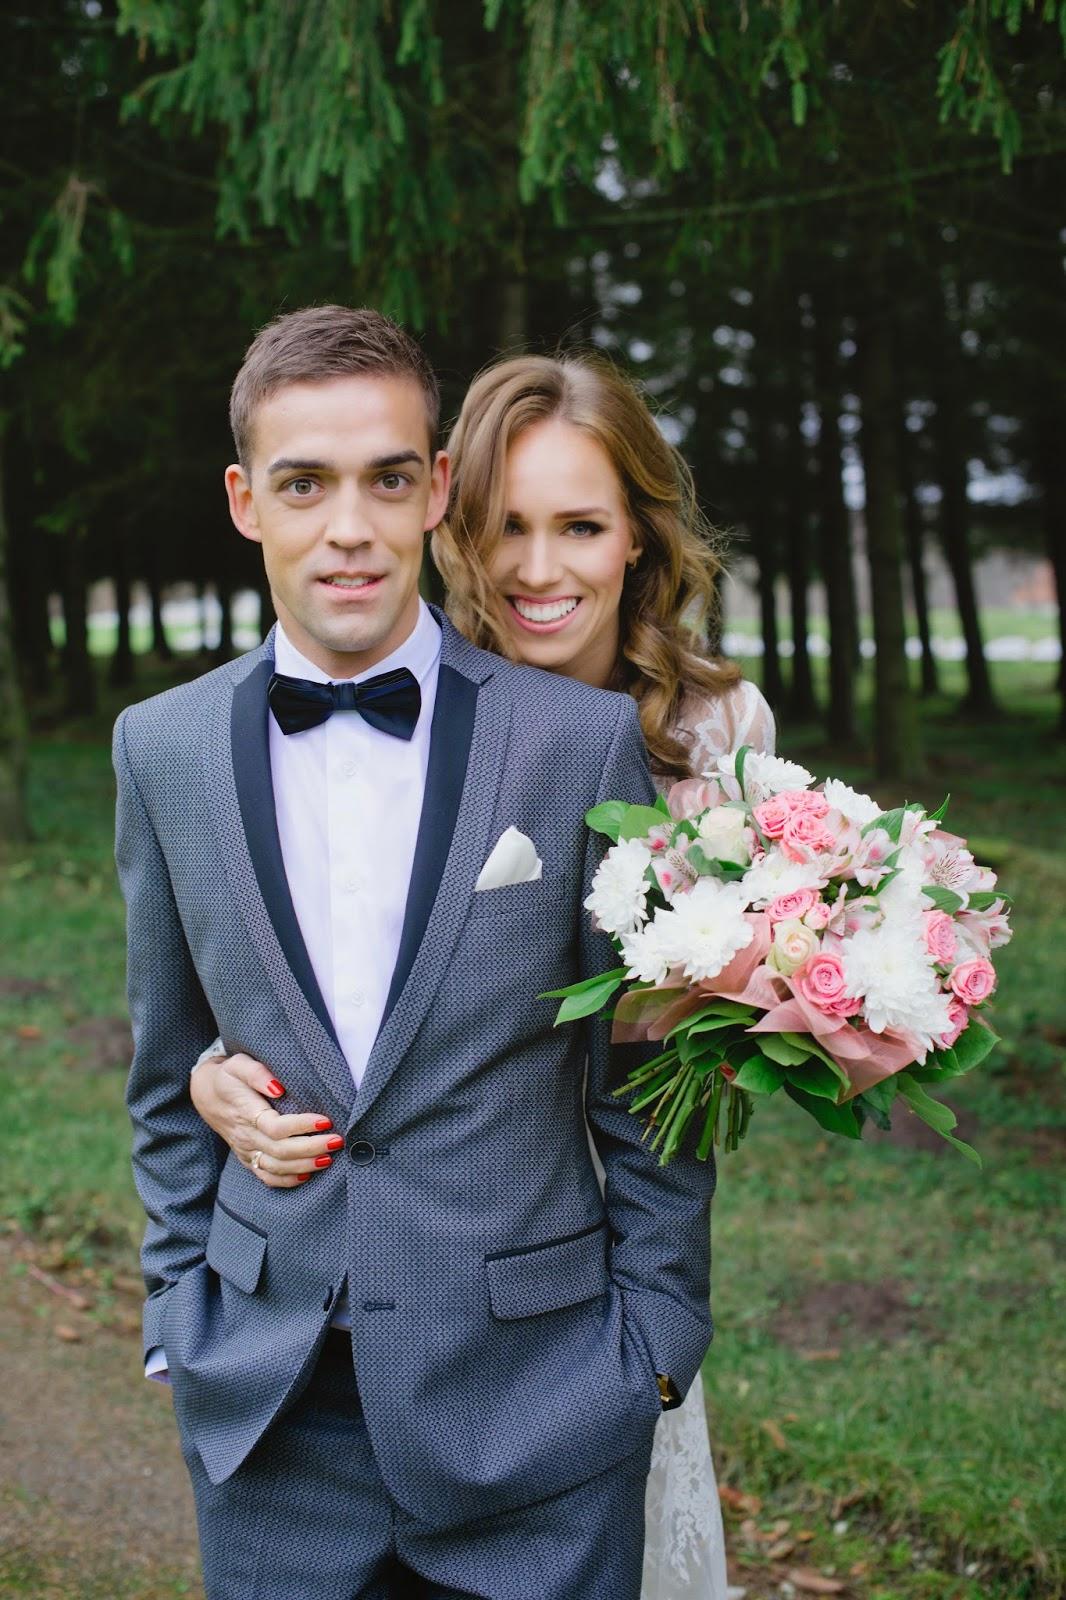 kristjaana-richard-mere-wedding-photo kristjaana ja richard mere pulm